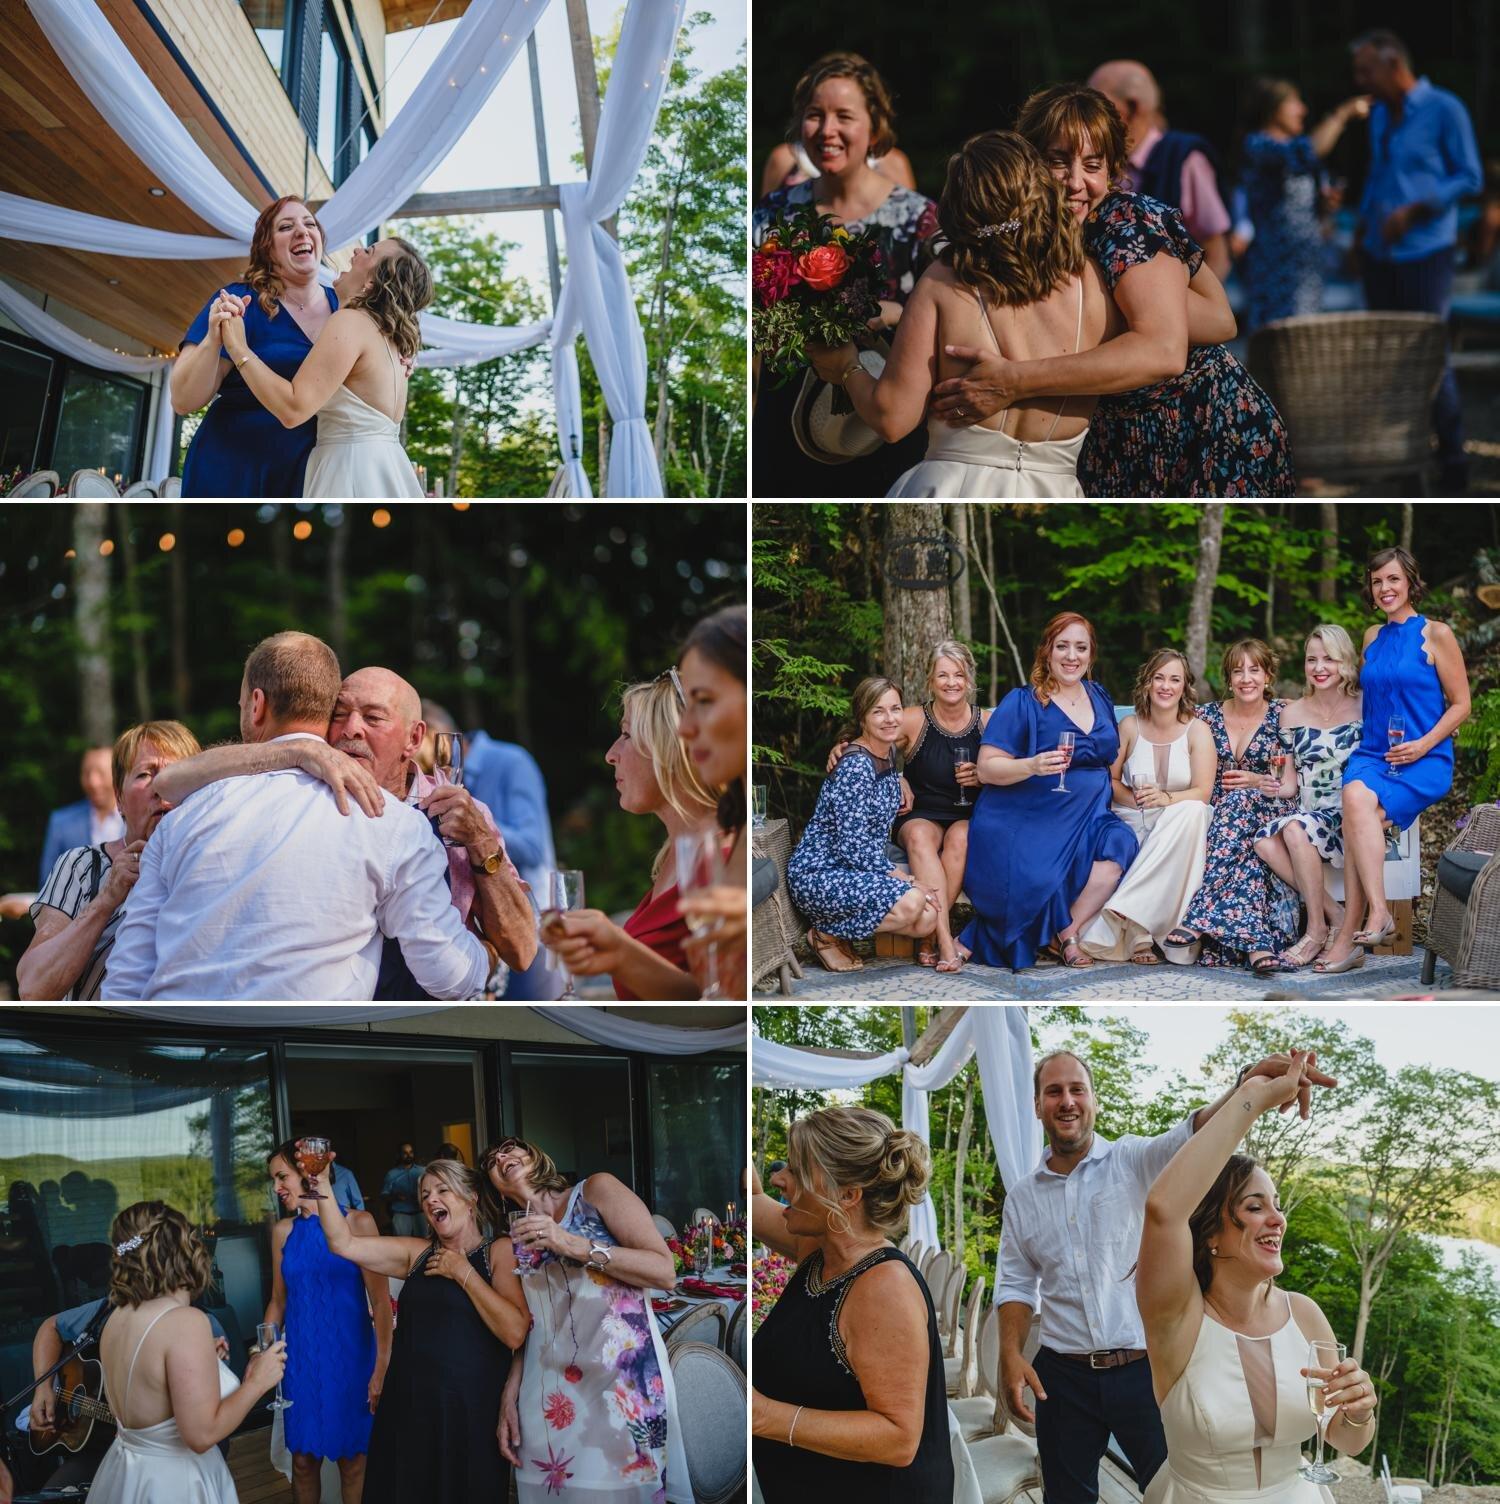 candid photographs at a wedding reception